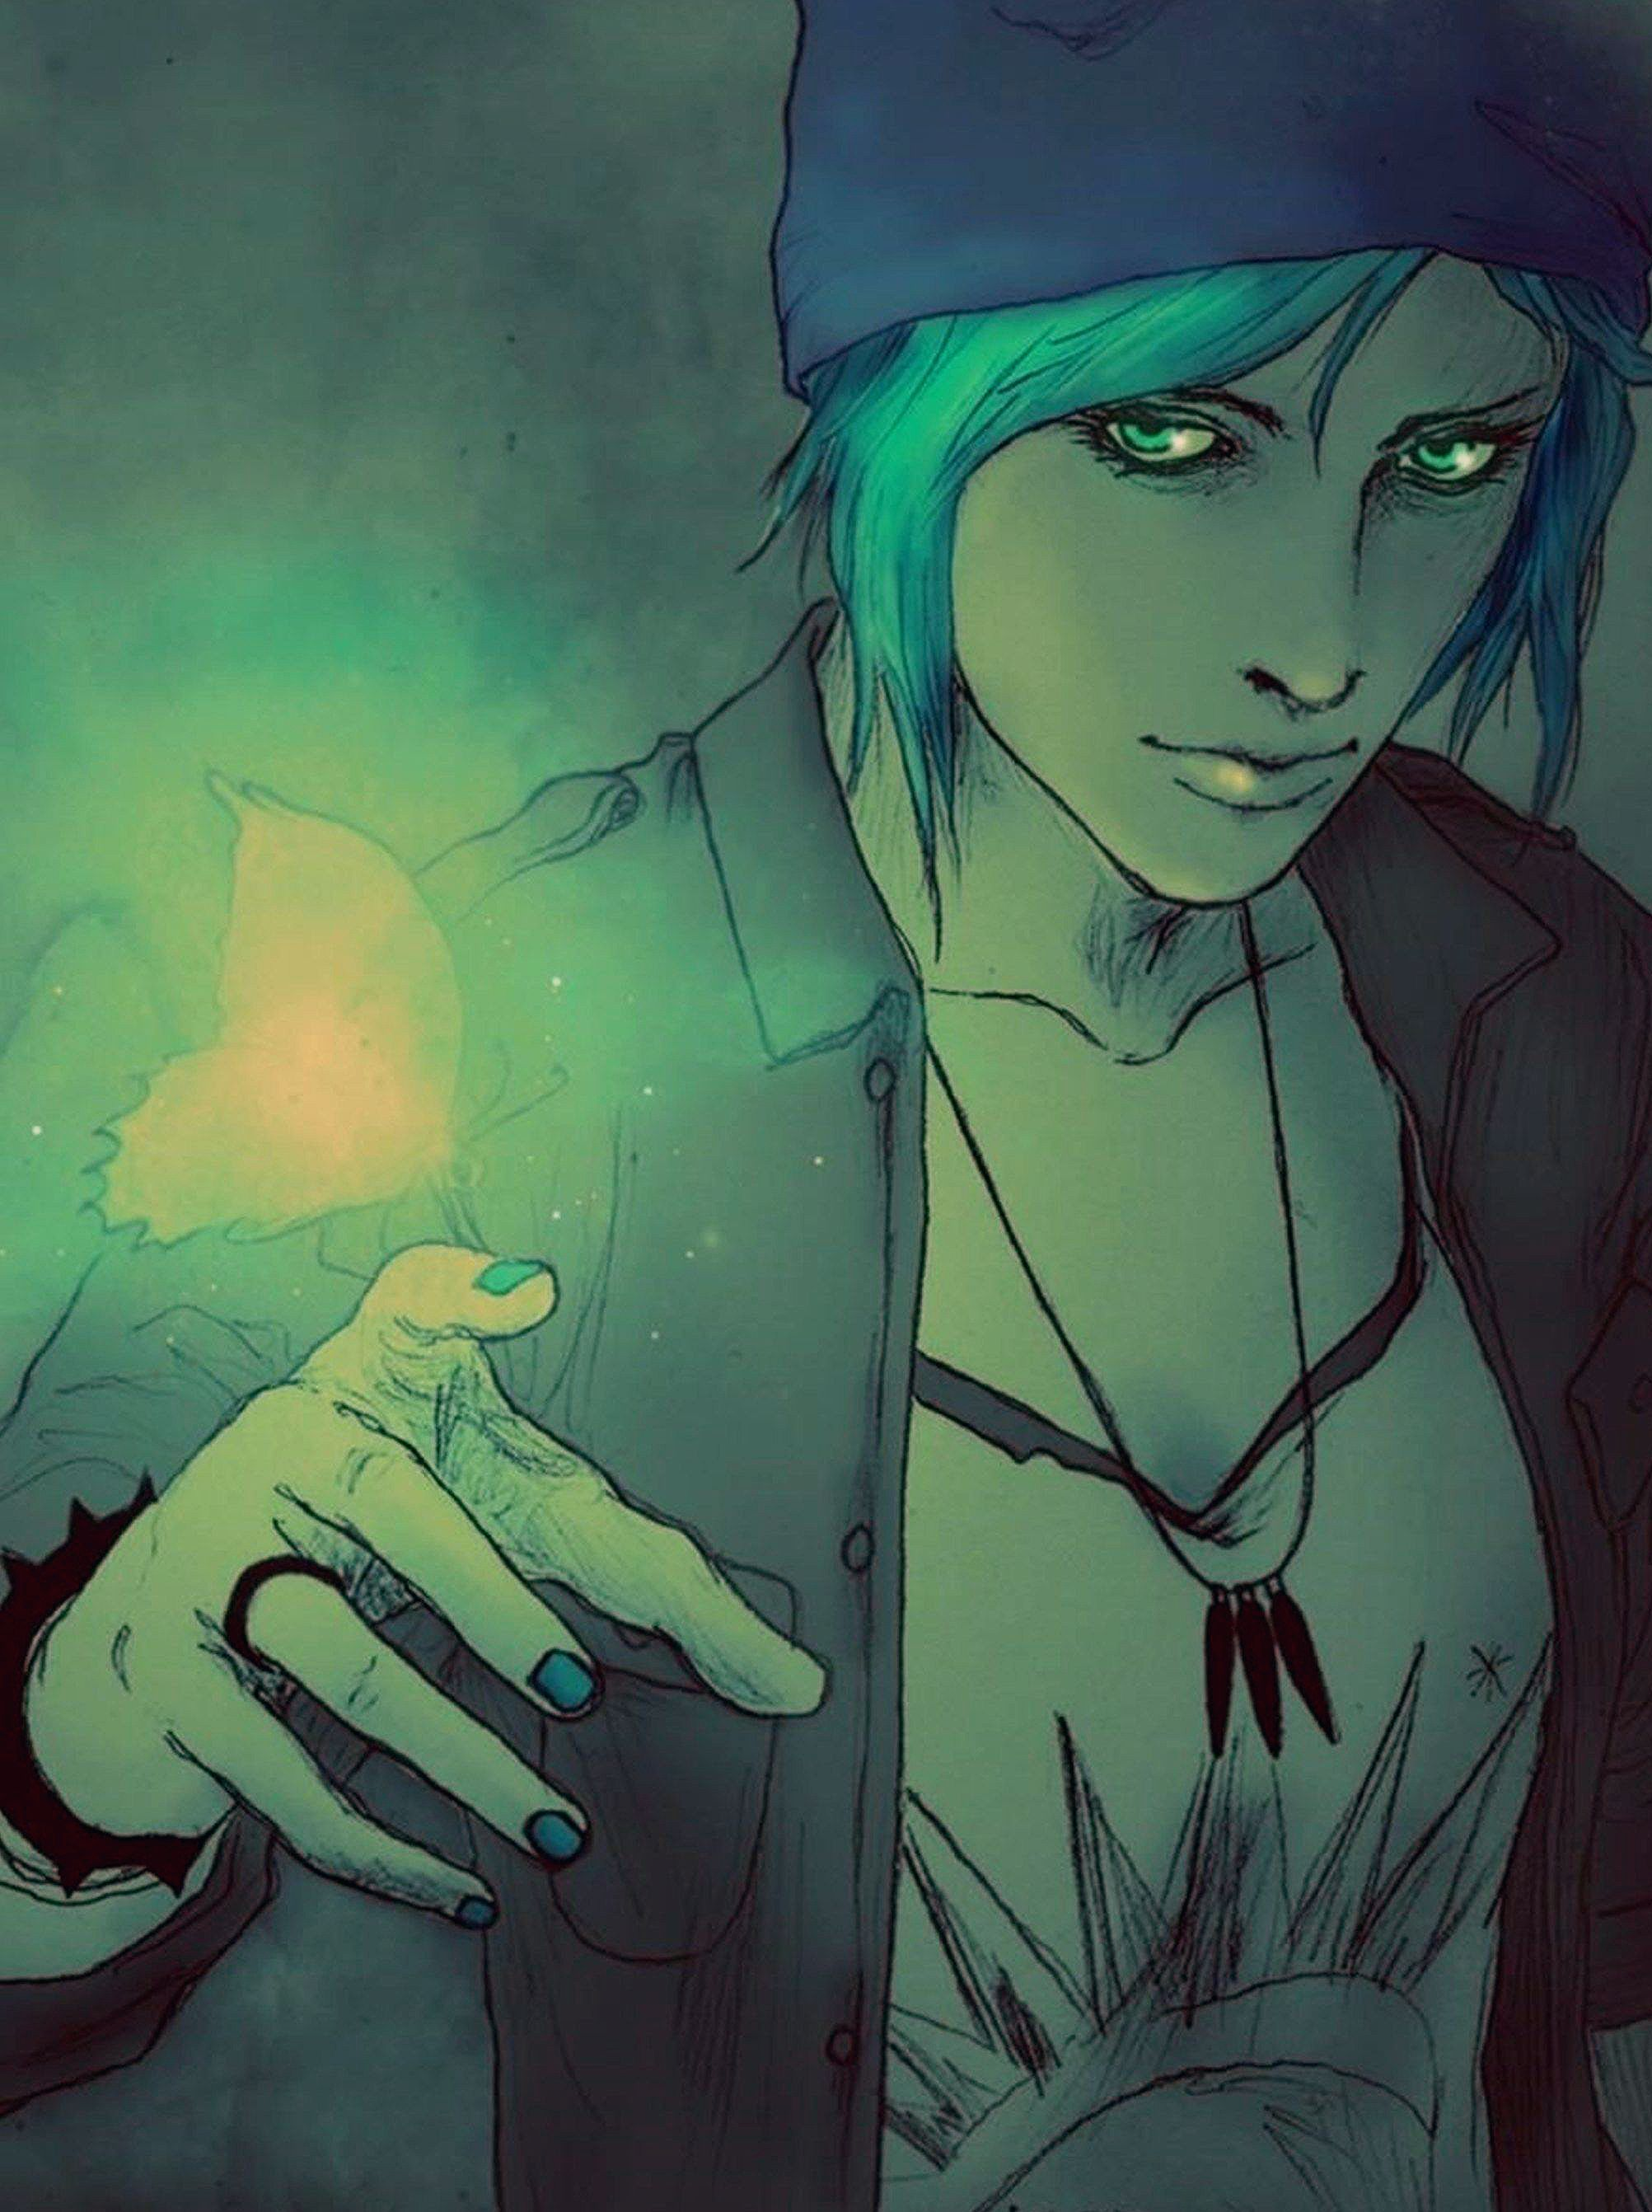 Misc Chloe Price Life Is Strange 2 Wallpapers Hd 4k Background For Android 4k Background Life Is Strange Anime